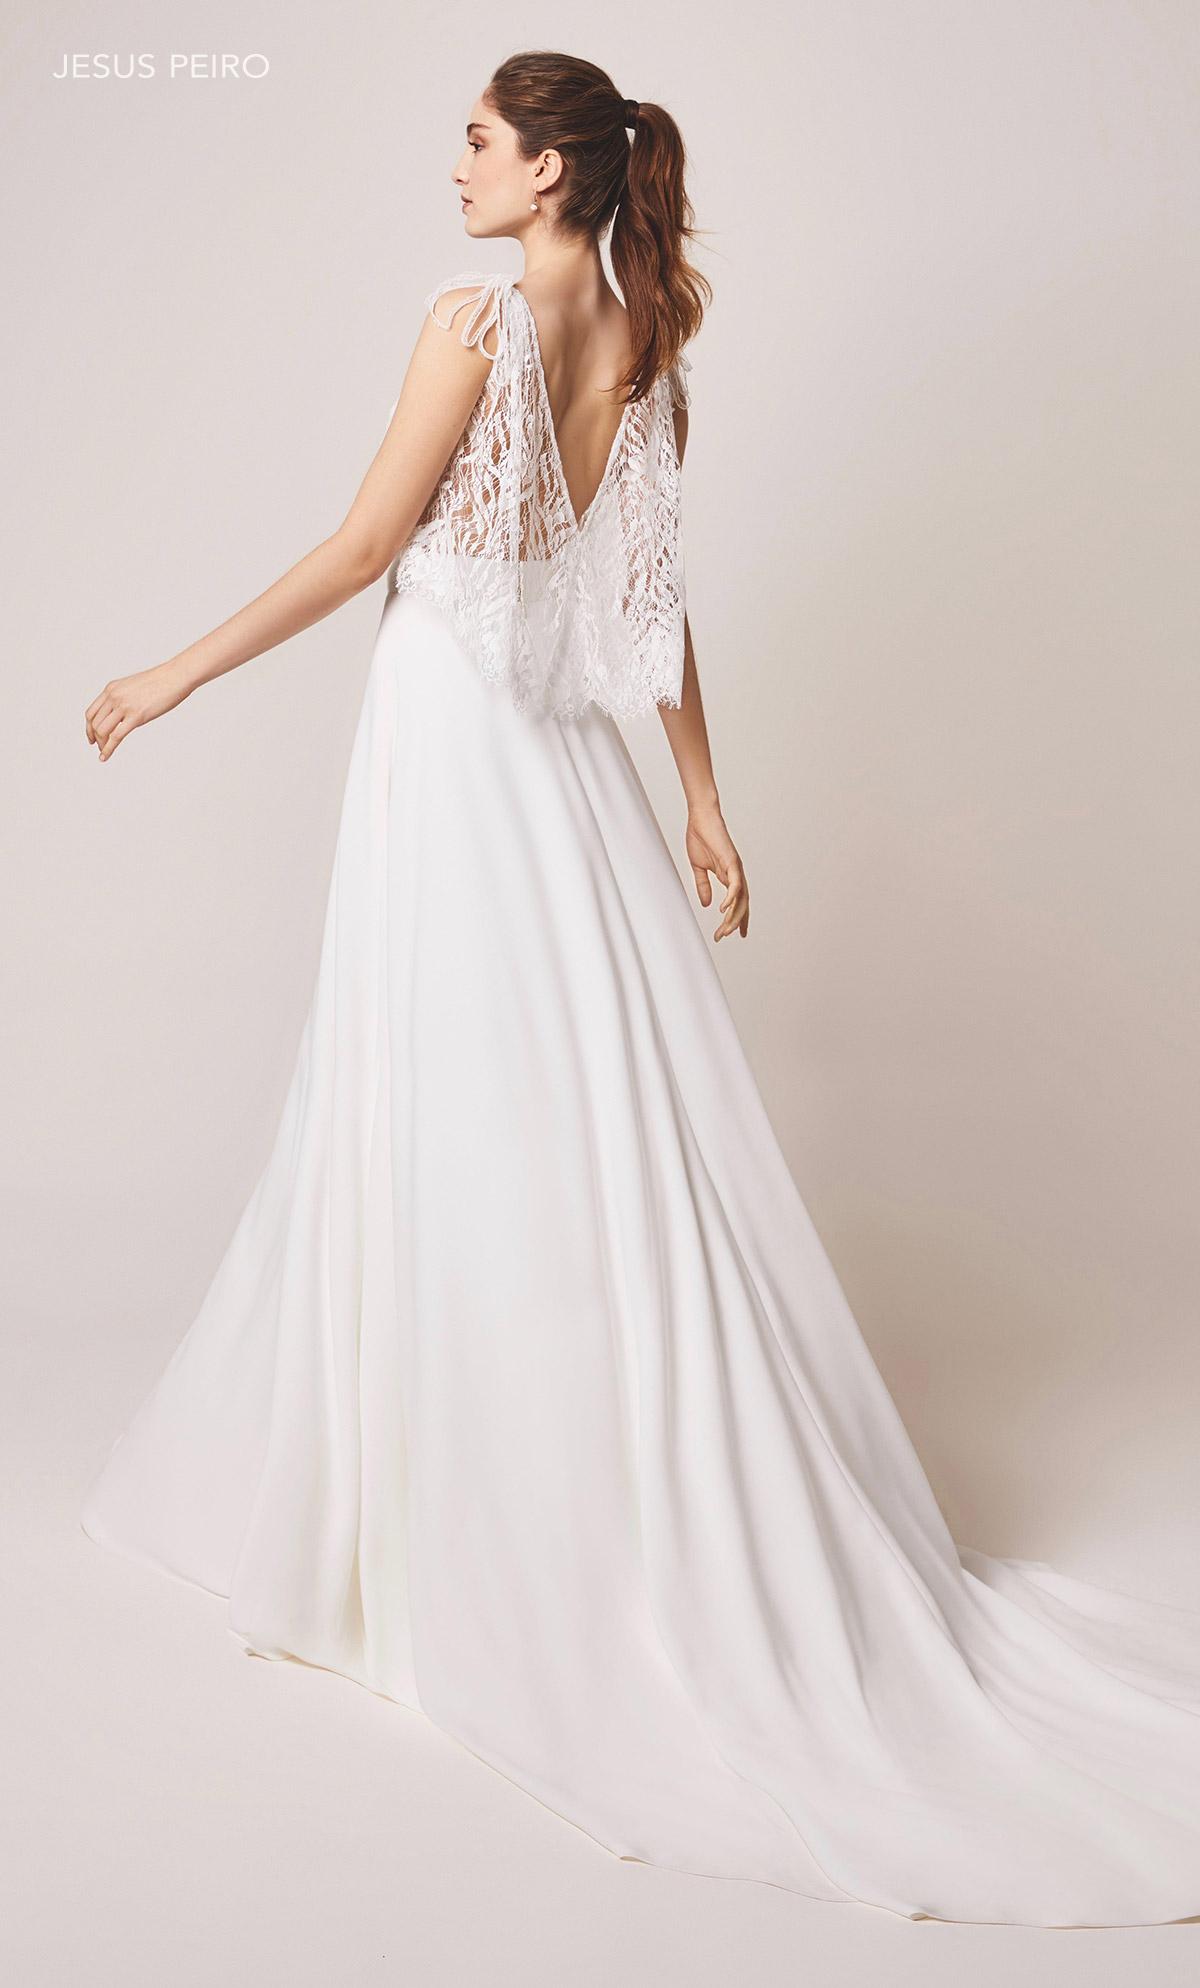 Vestido novia Jesús Peiró Ref.103